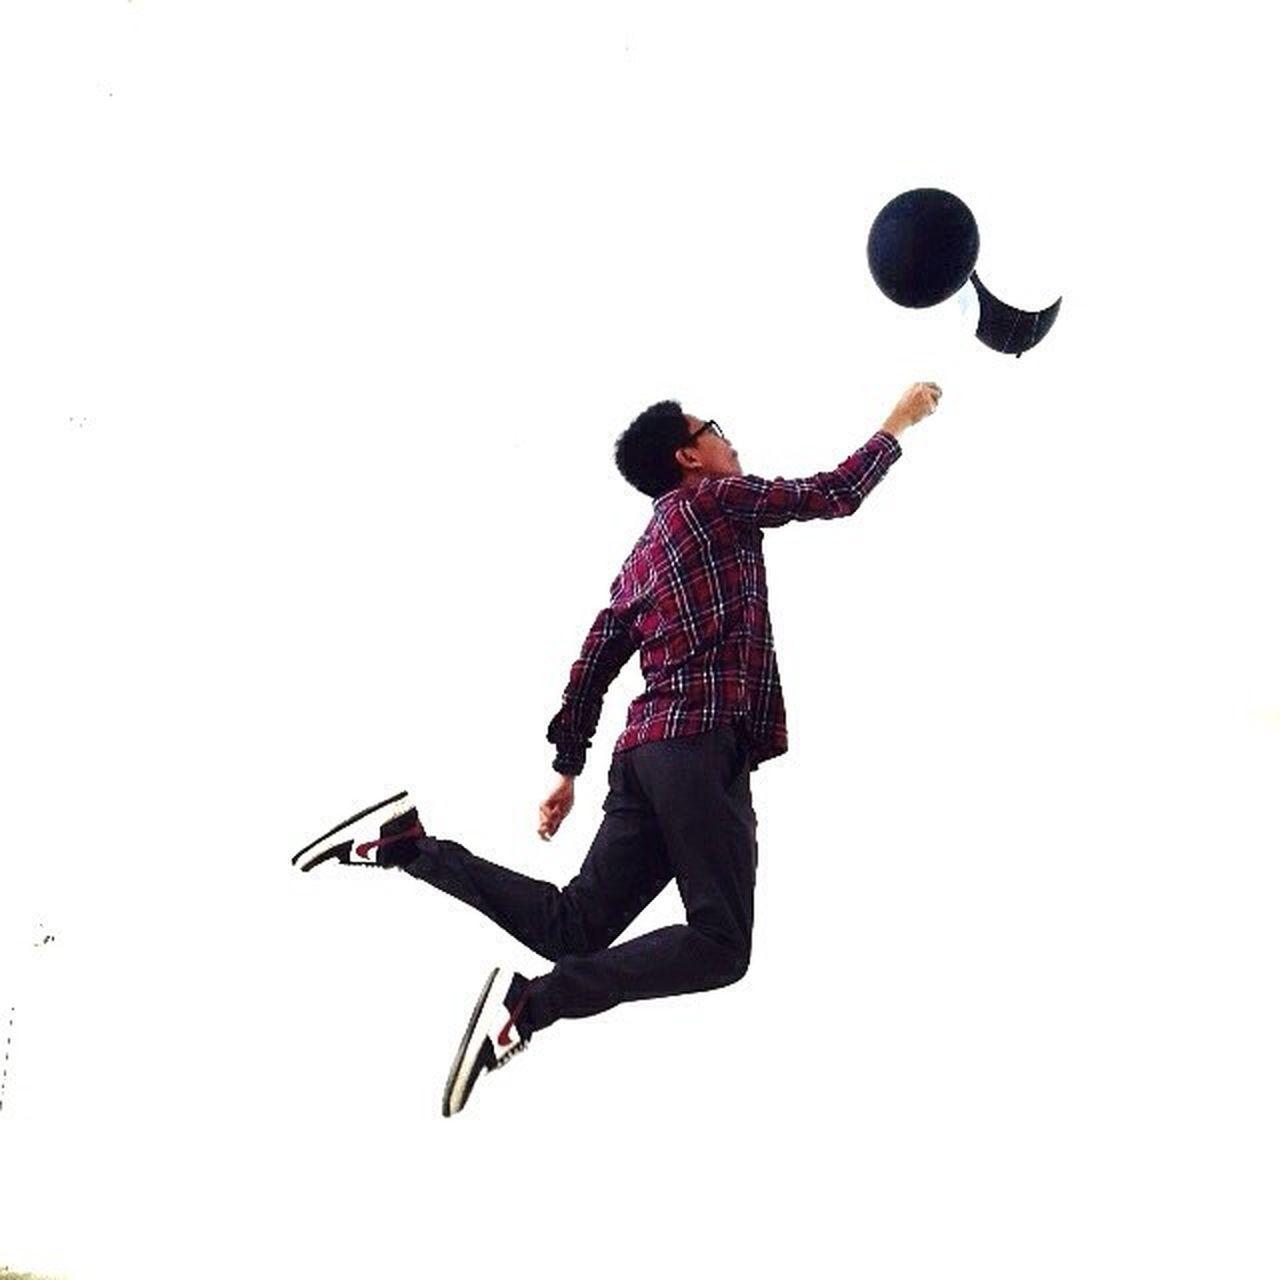 catch your dreams! ___________________________ yok follow @lenovomobileid @instameetindonesia siapa tau rezeki @nurulsanantri @yogiwaliysatrio @eldirafatia @rendi_matthews @syahafsa PowerForYourLife Lenovo_bodymove Lenovo_Instameet Lenovo_powerchallenge